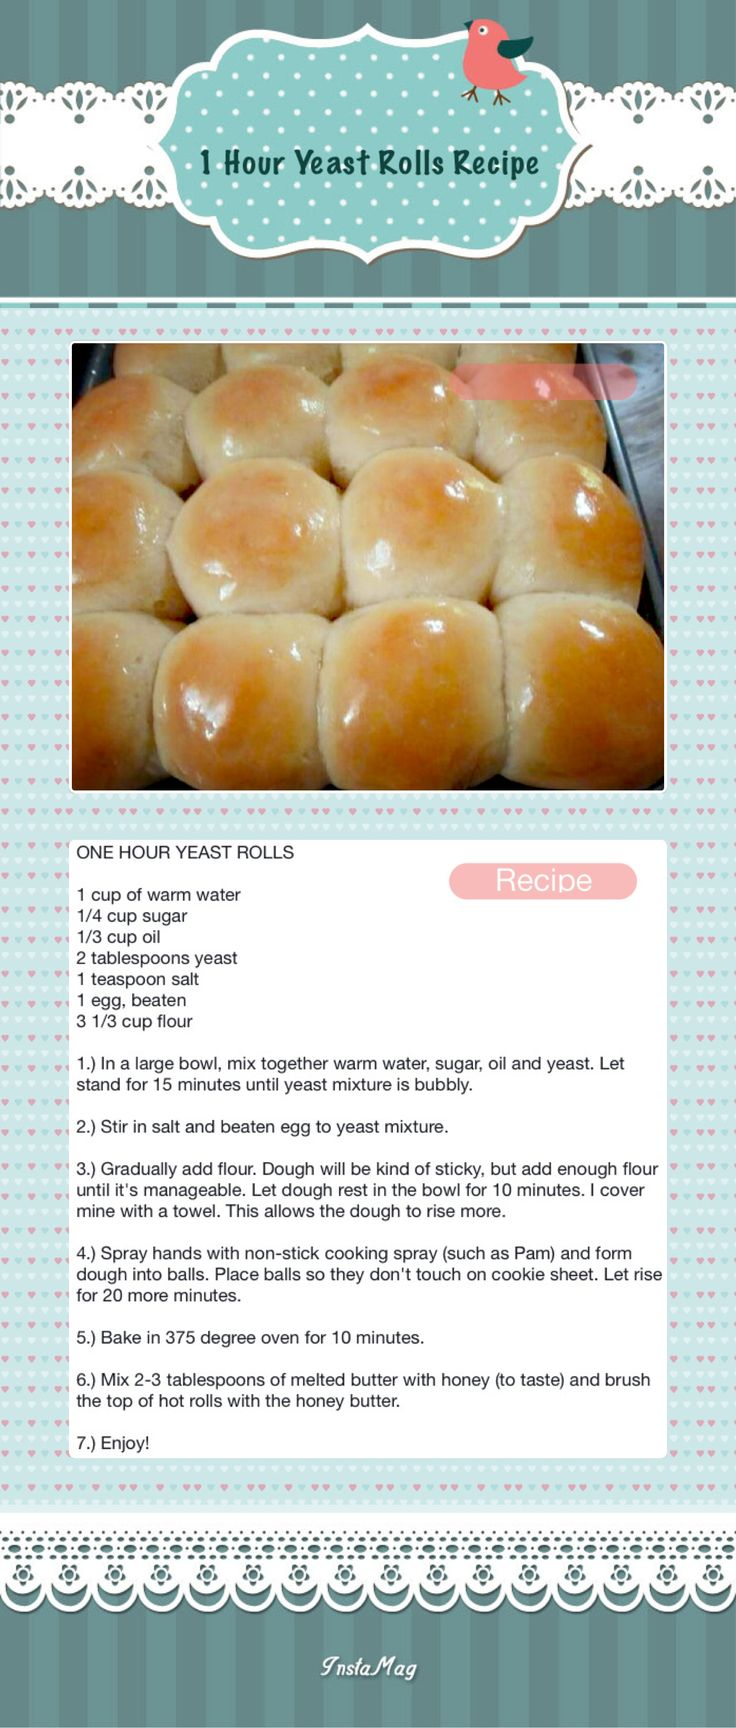 1 Hour Yeast Rolls Recipe